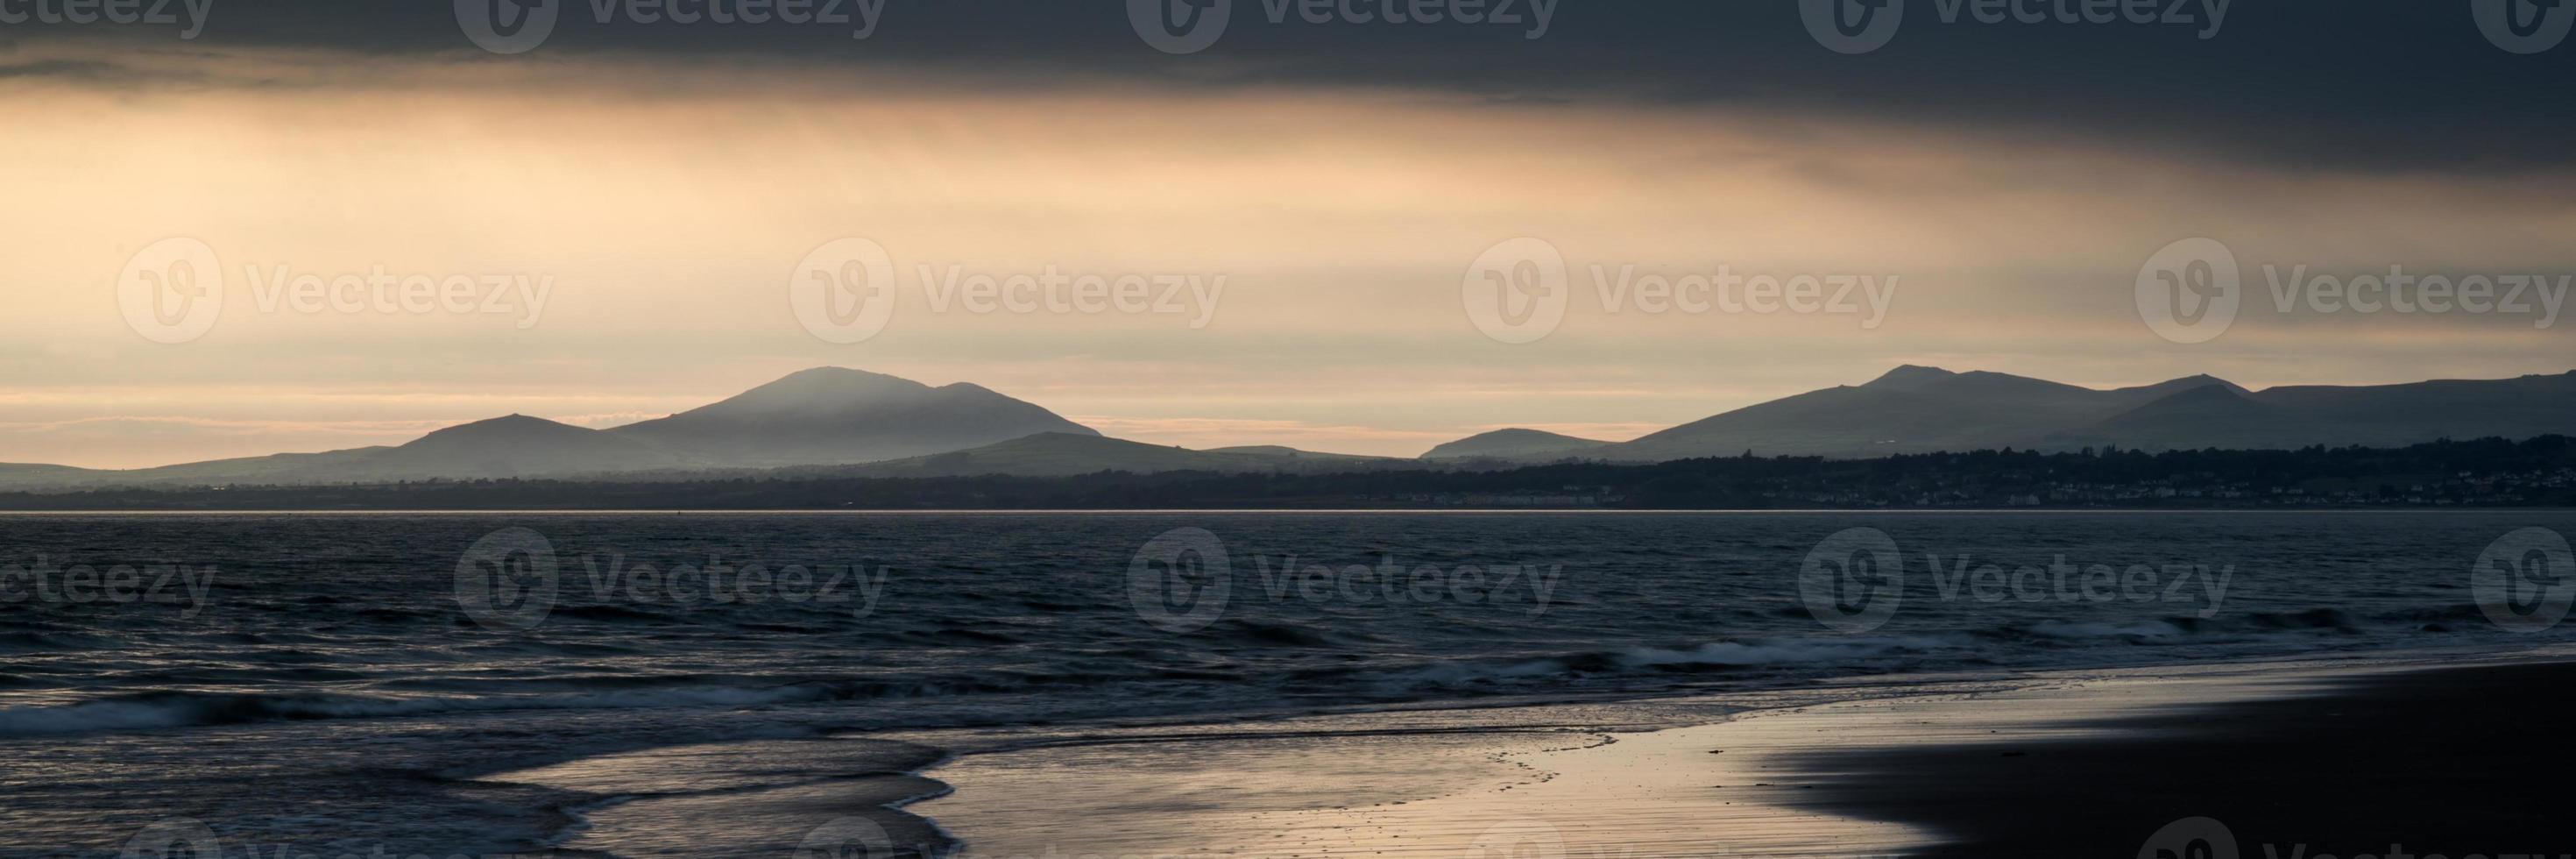 Panoramalandschaft atemberaubende Bergkette und Strand bei lebendigem Sonnenuntergang foto